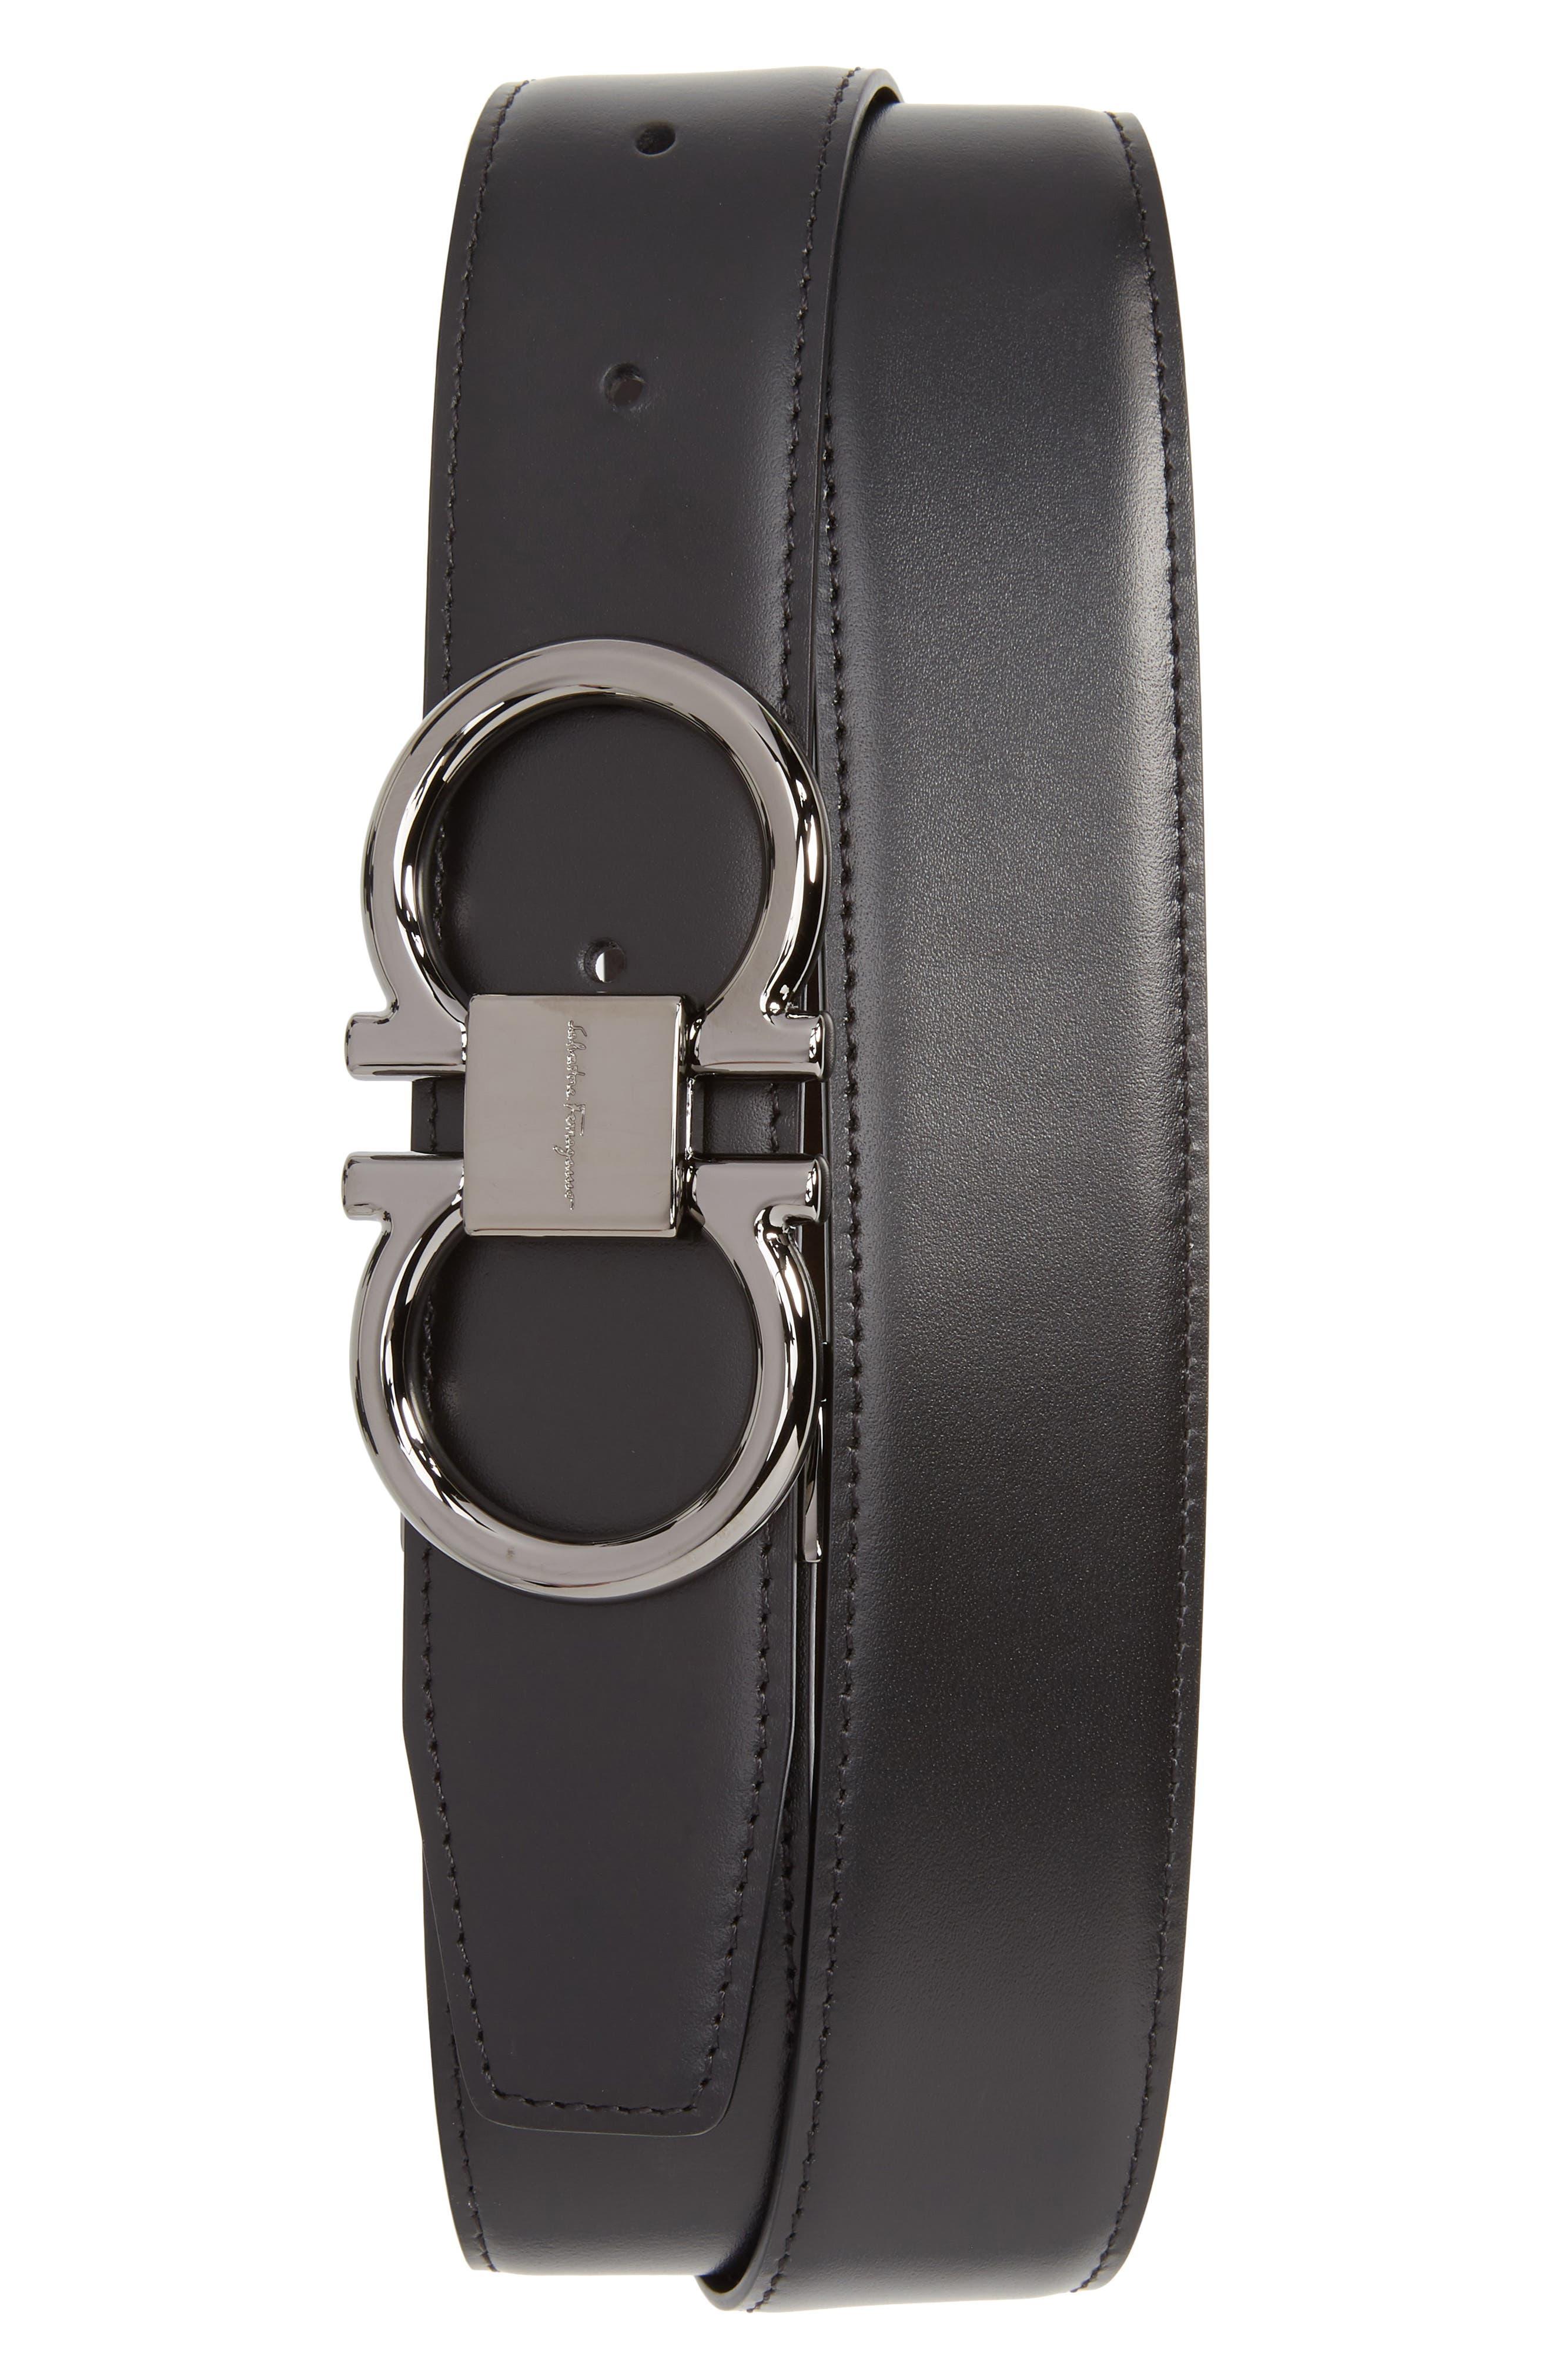 SALVATORE FERRAGAMO Gancio Reversible Calfskin Leather Belt, Main, color, BLACK/ HICKORY